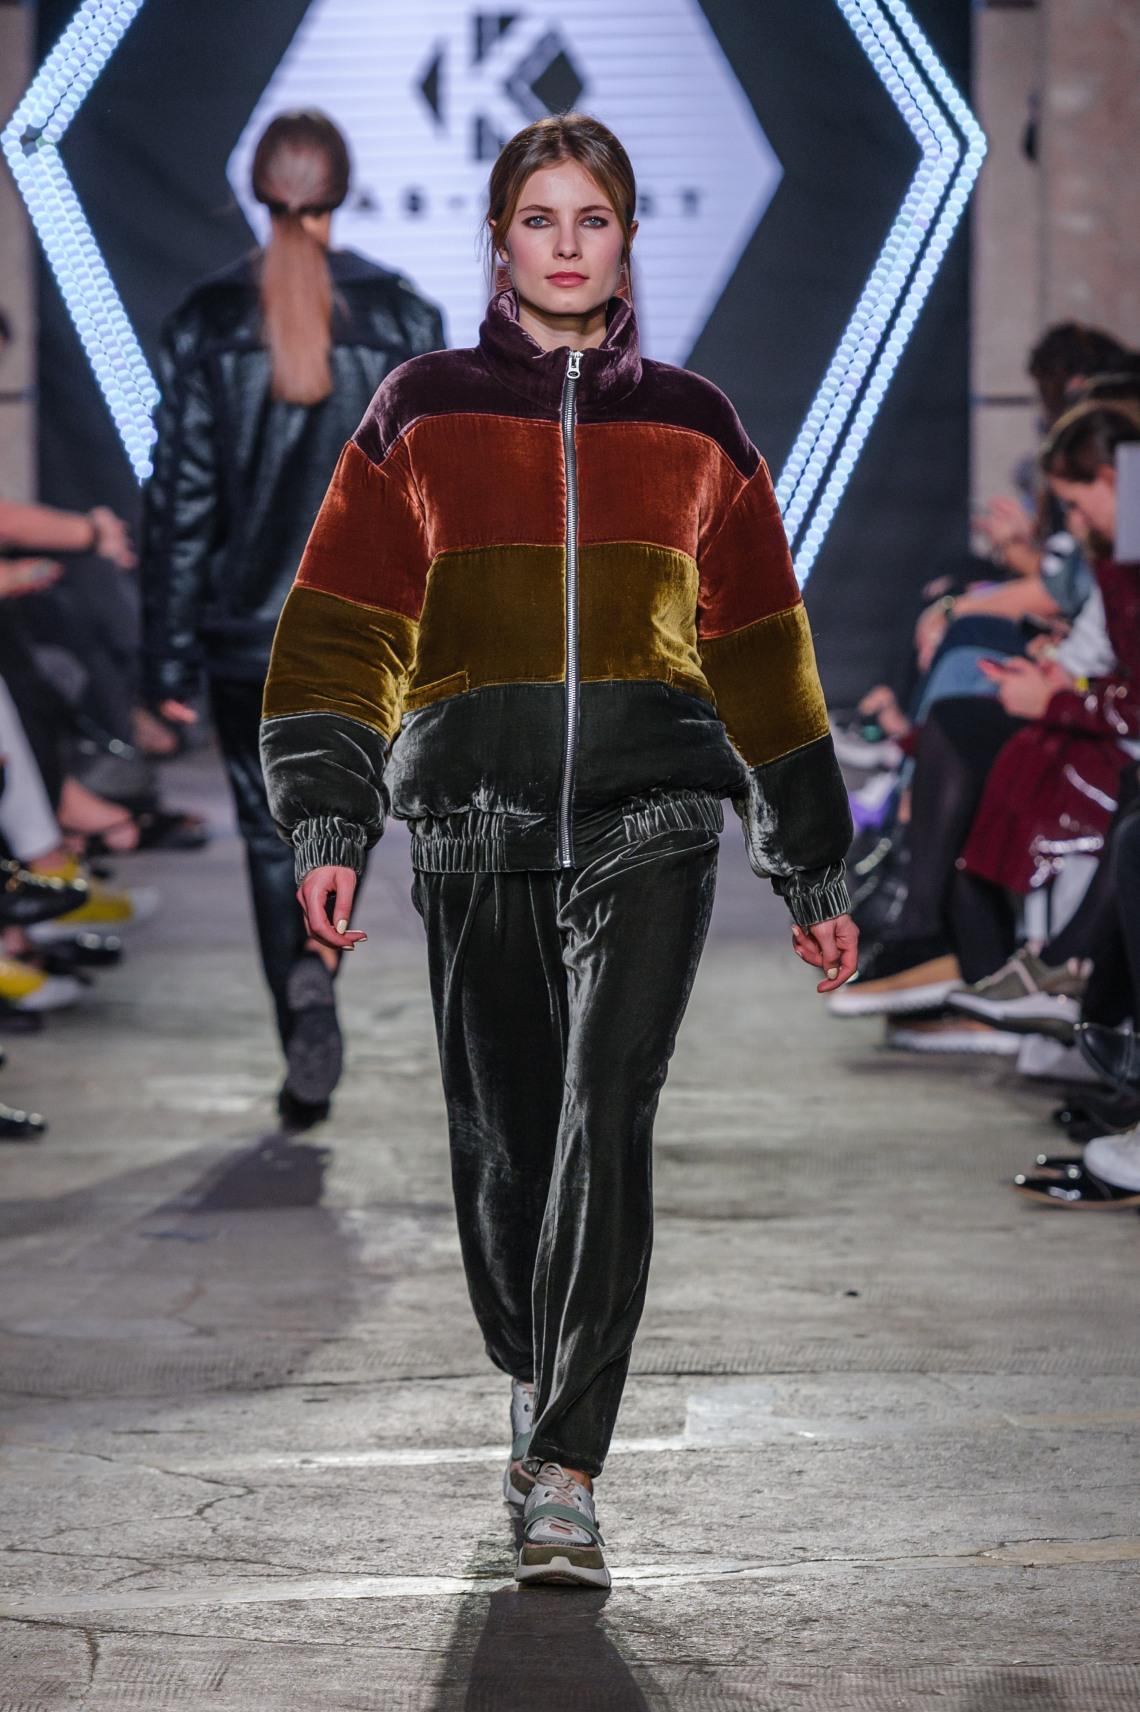 6ktw-101118_15-kaskryst_highres_fotfilipokopny-fashionimages